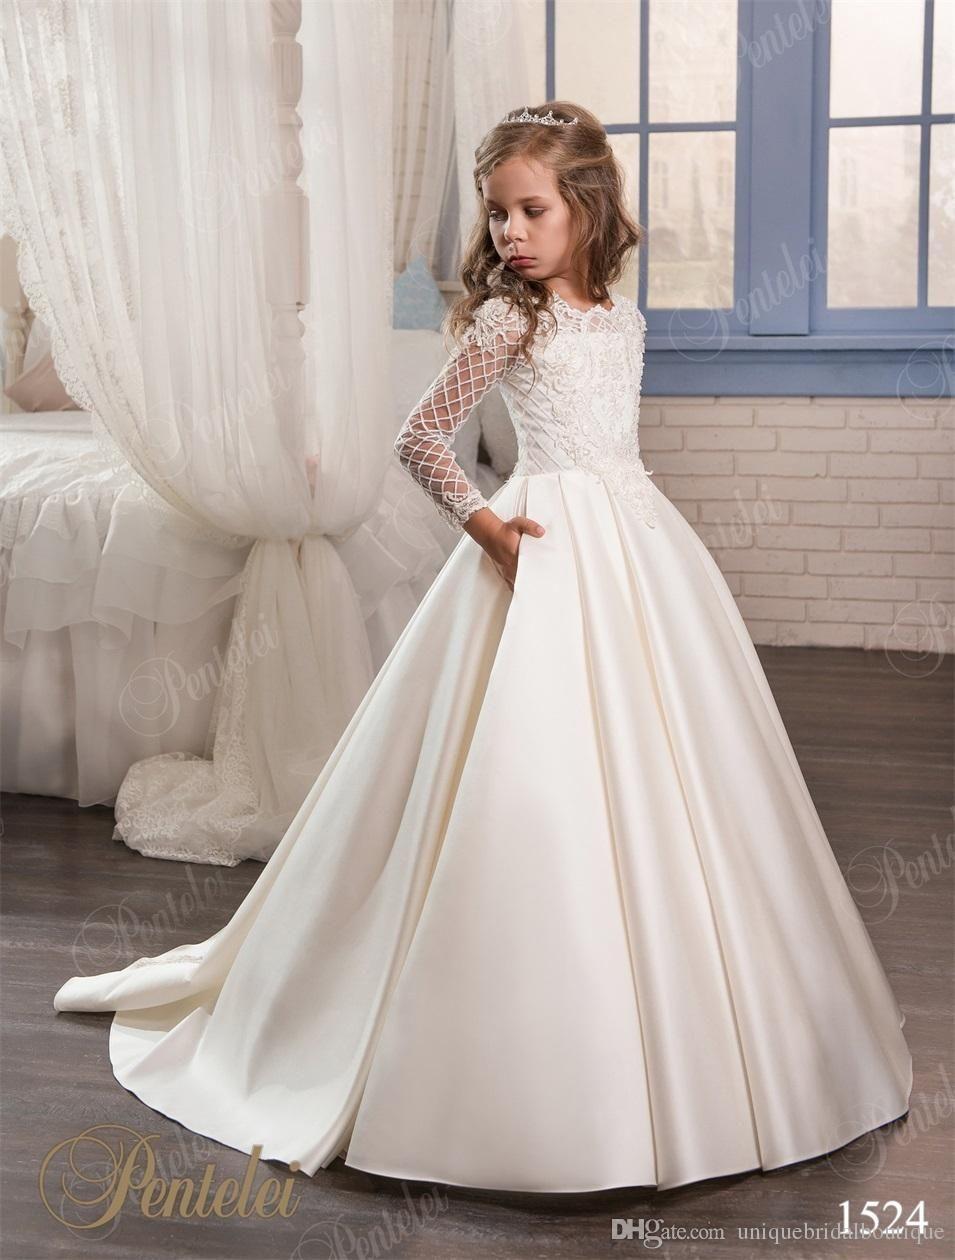 Wedding Dresses for Little Girls 2017 Pentelei Cheap with